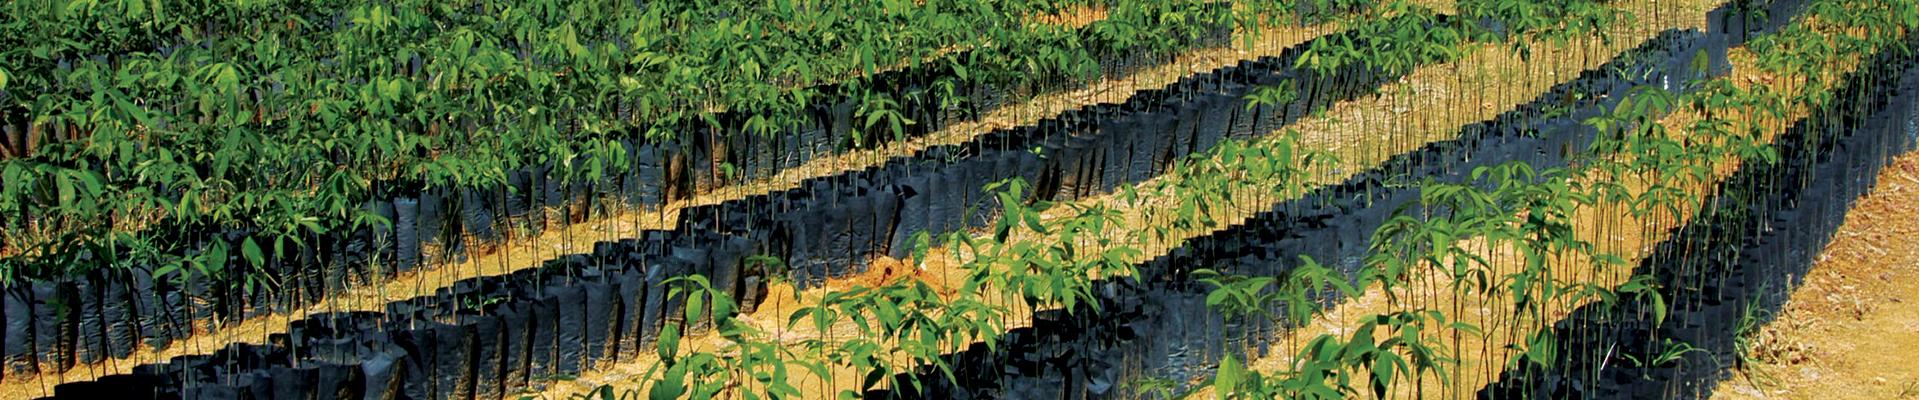 Brazilian Rubber Plantation